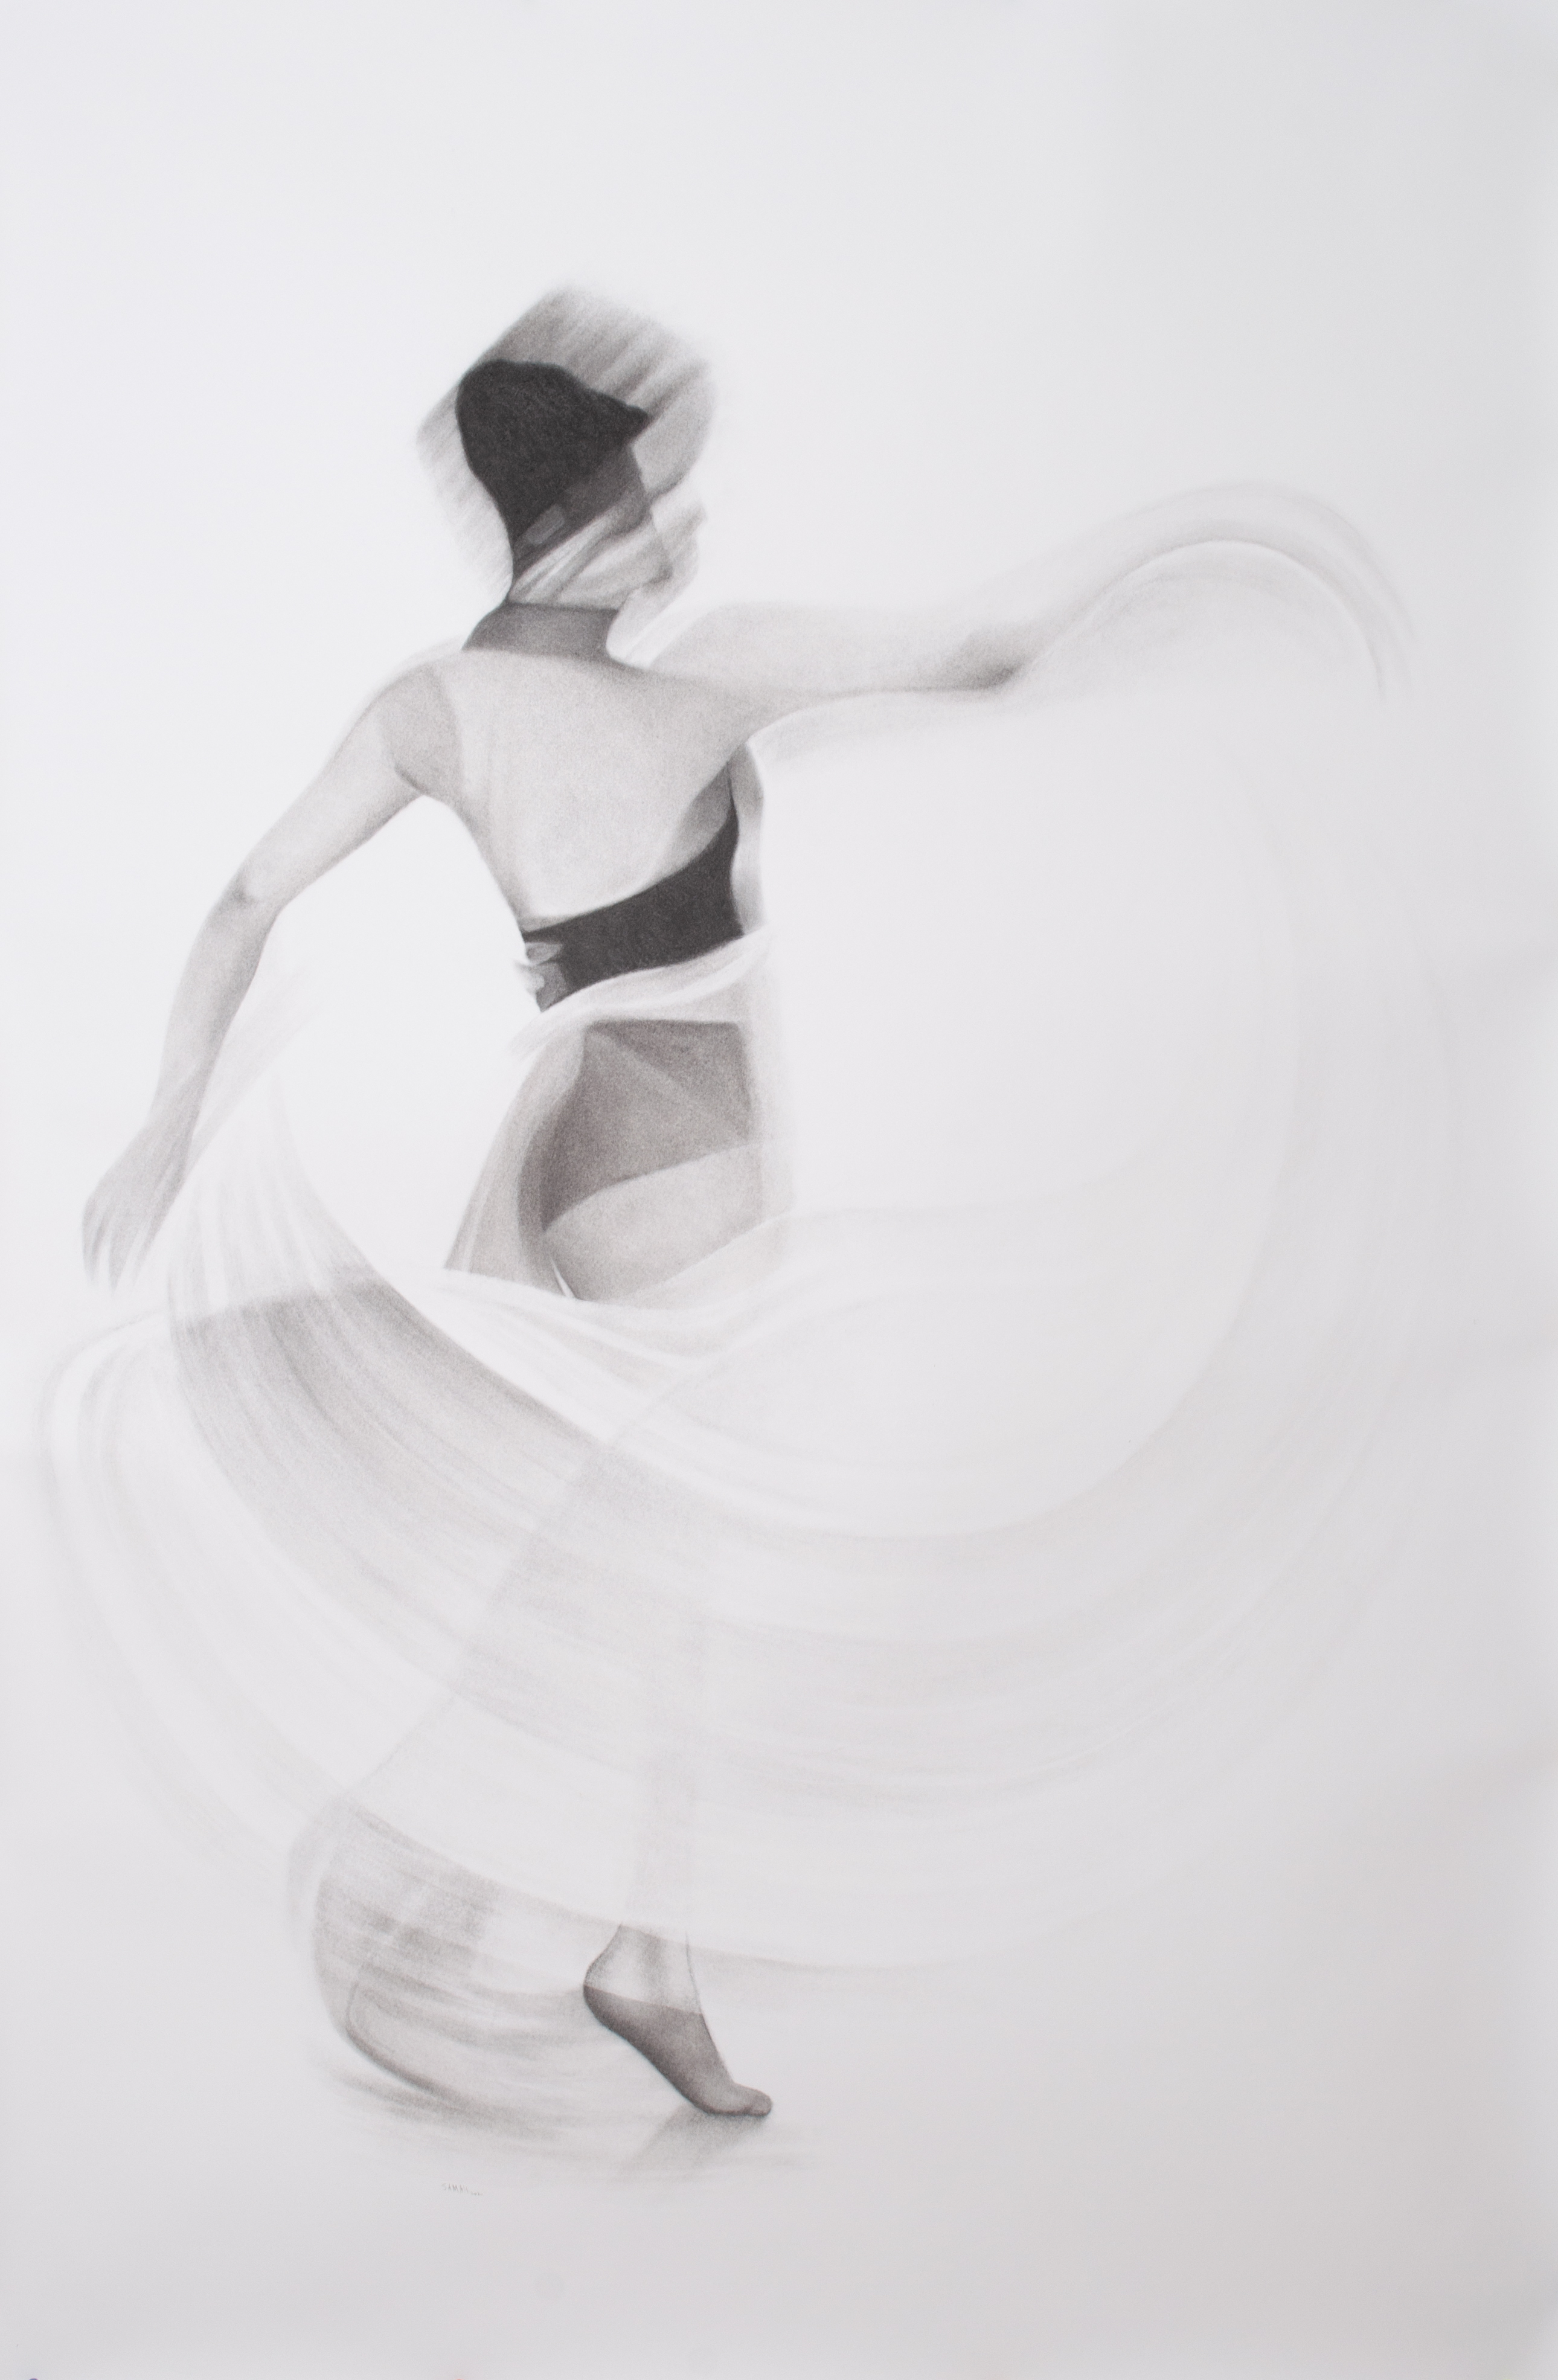 Shamah Shihadi / Disappearnce